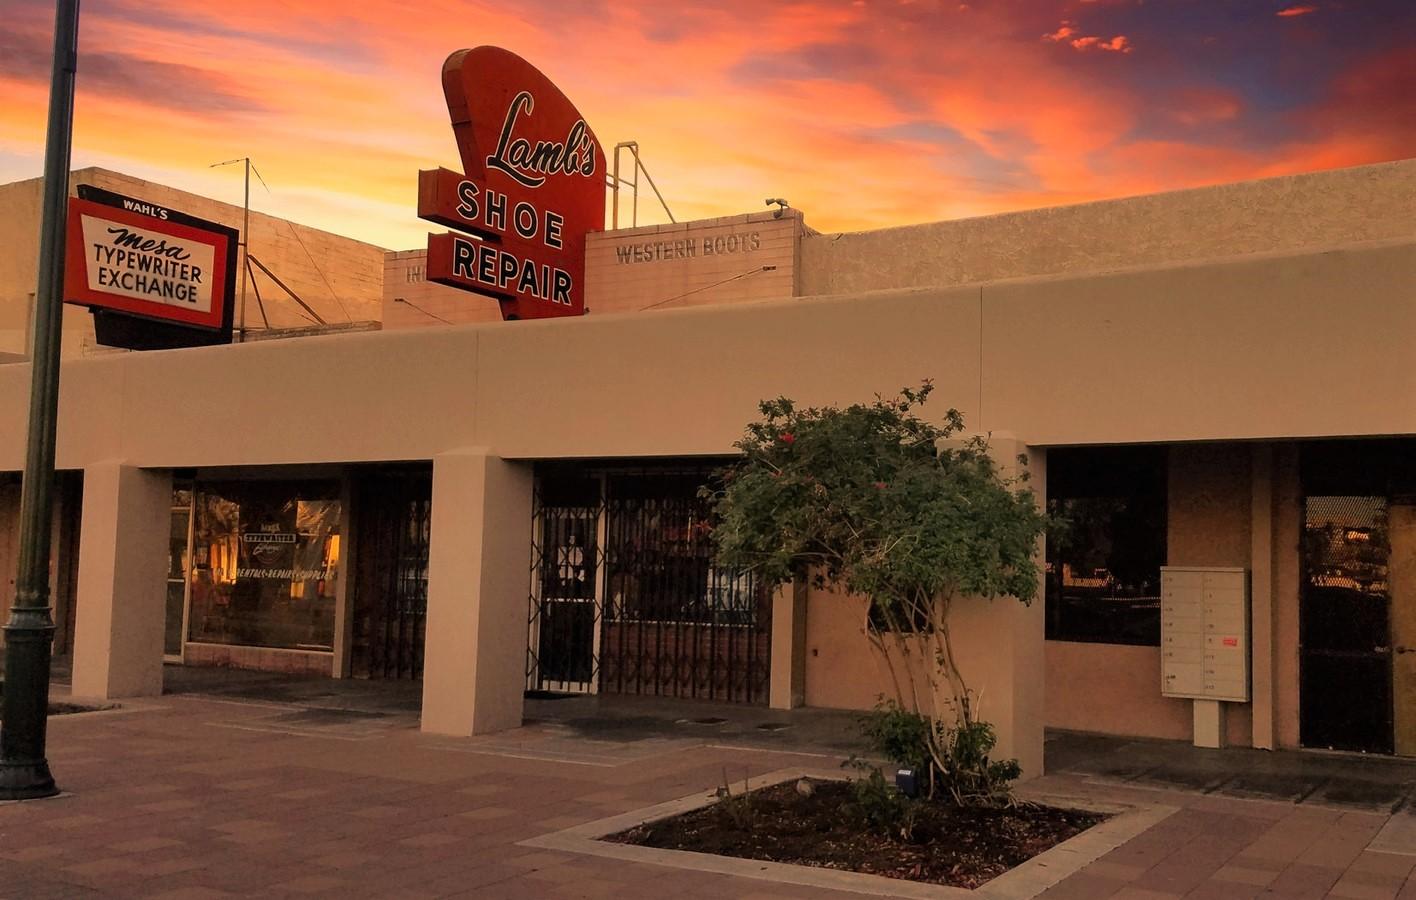 28 S MacDonald, Mesa AZ 85210 Retail Storefront